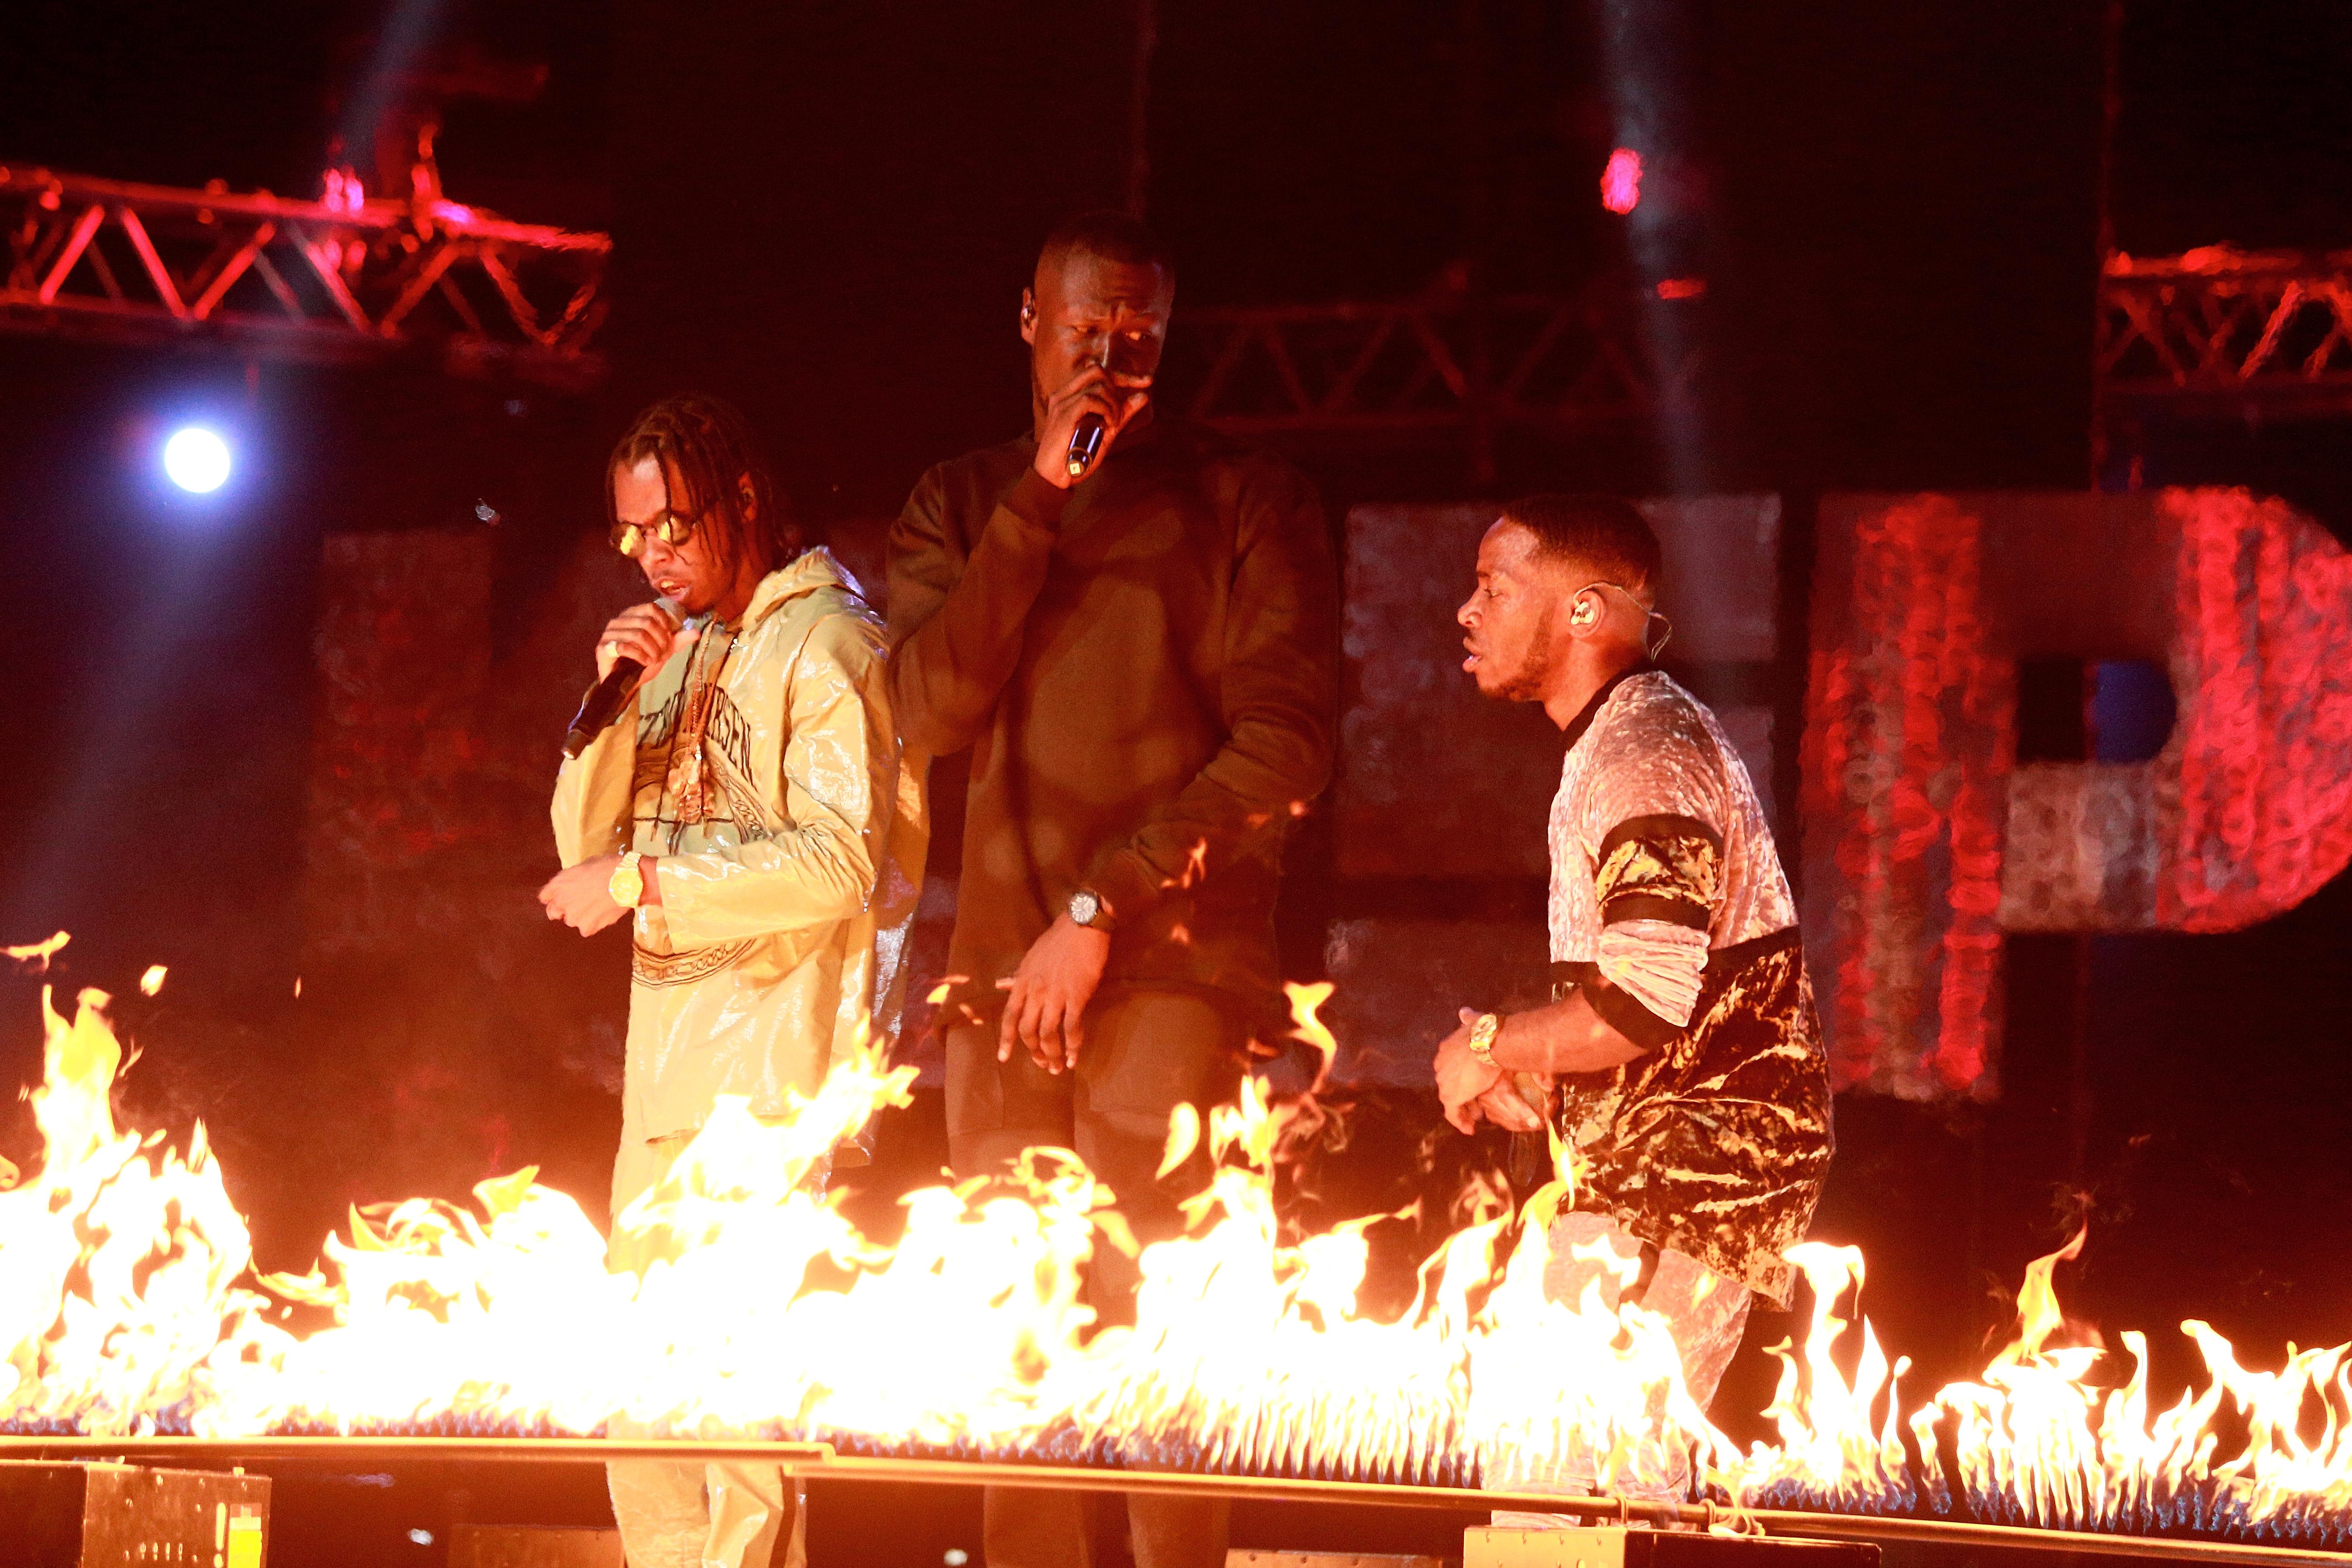 Stormzy performing with Krept & Konan at the MOBOS